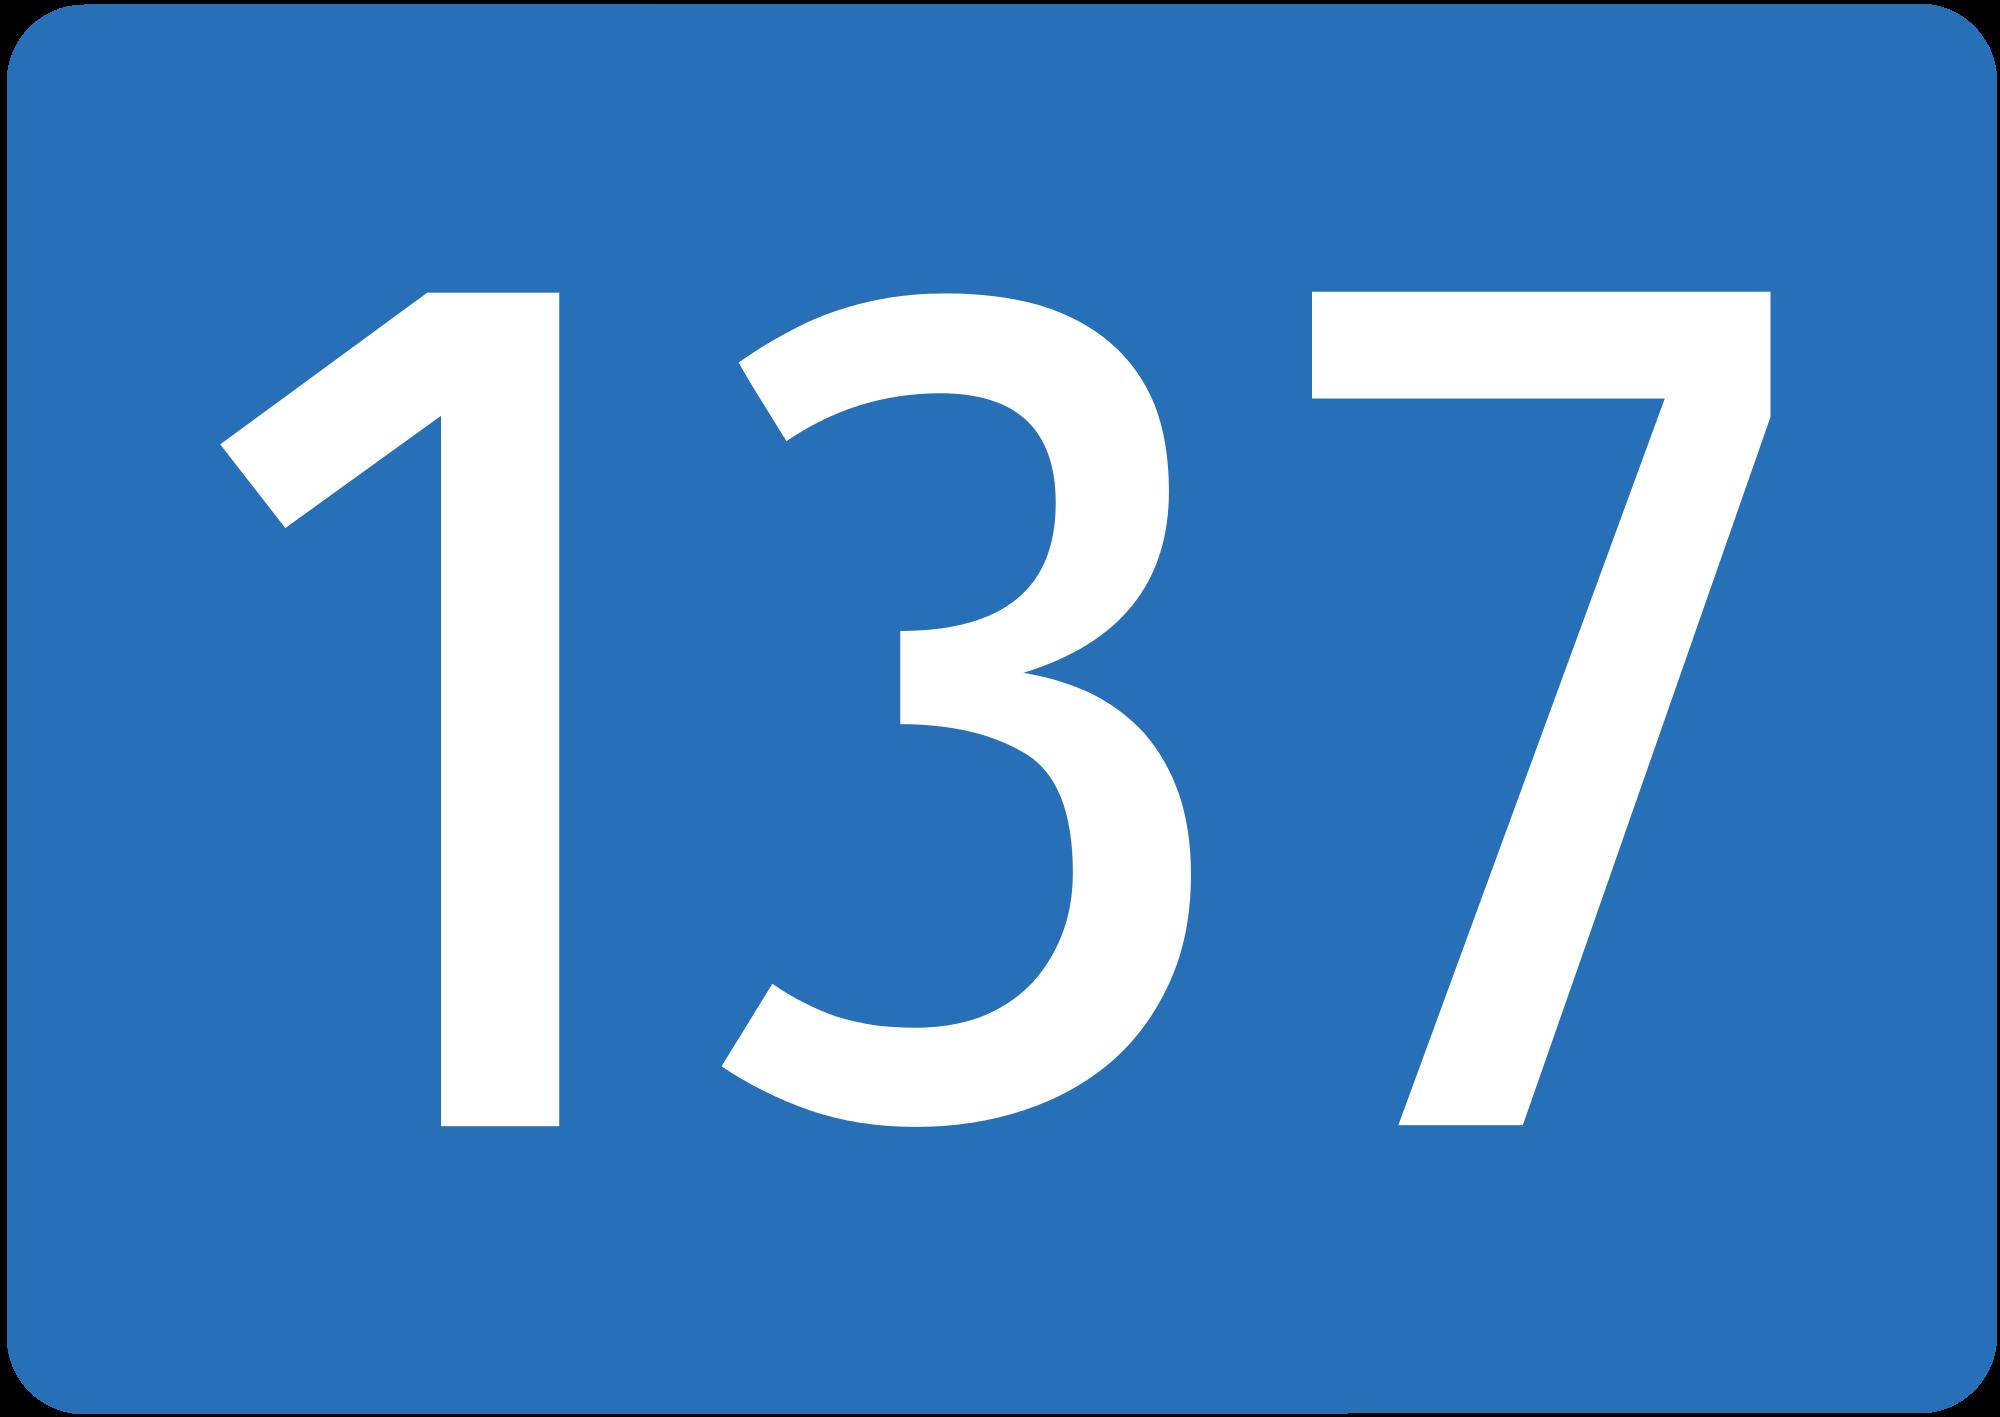 File:B137.